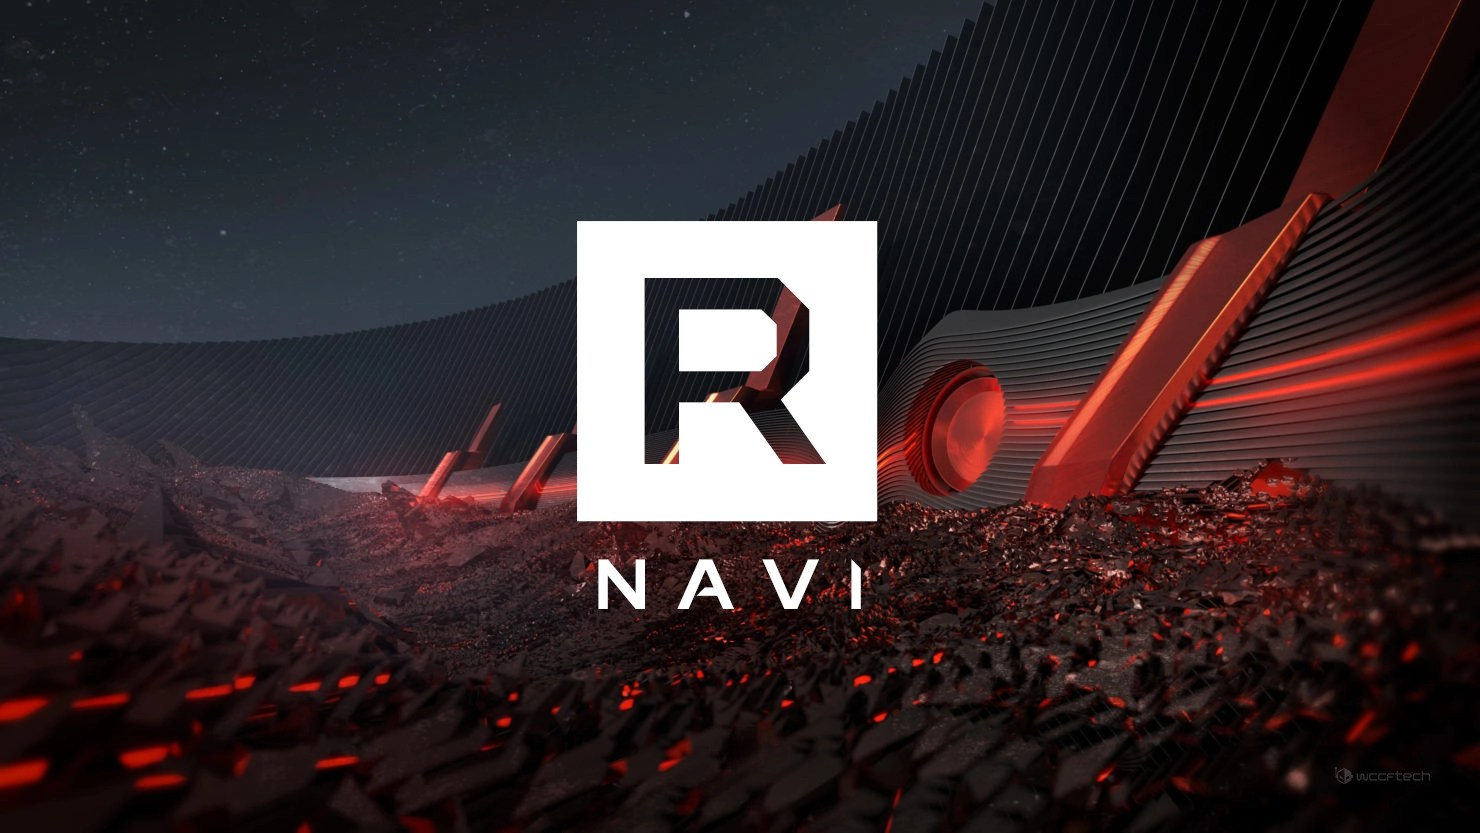 Future Amd Navi 21 Leaks Navi 10 Refresh For Budget Gpus Technosports